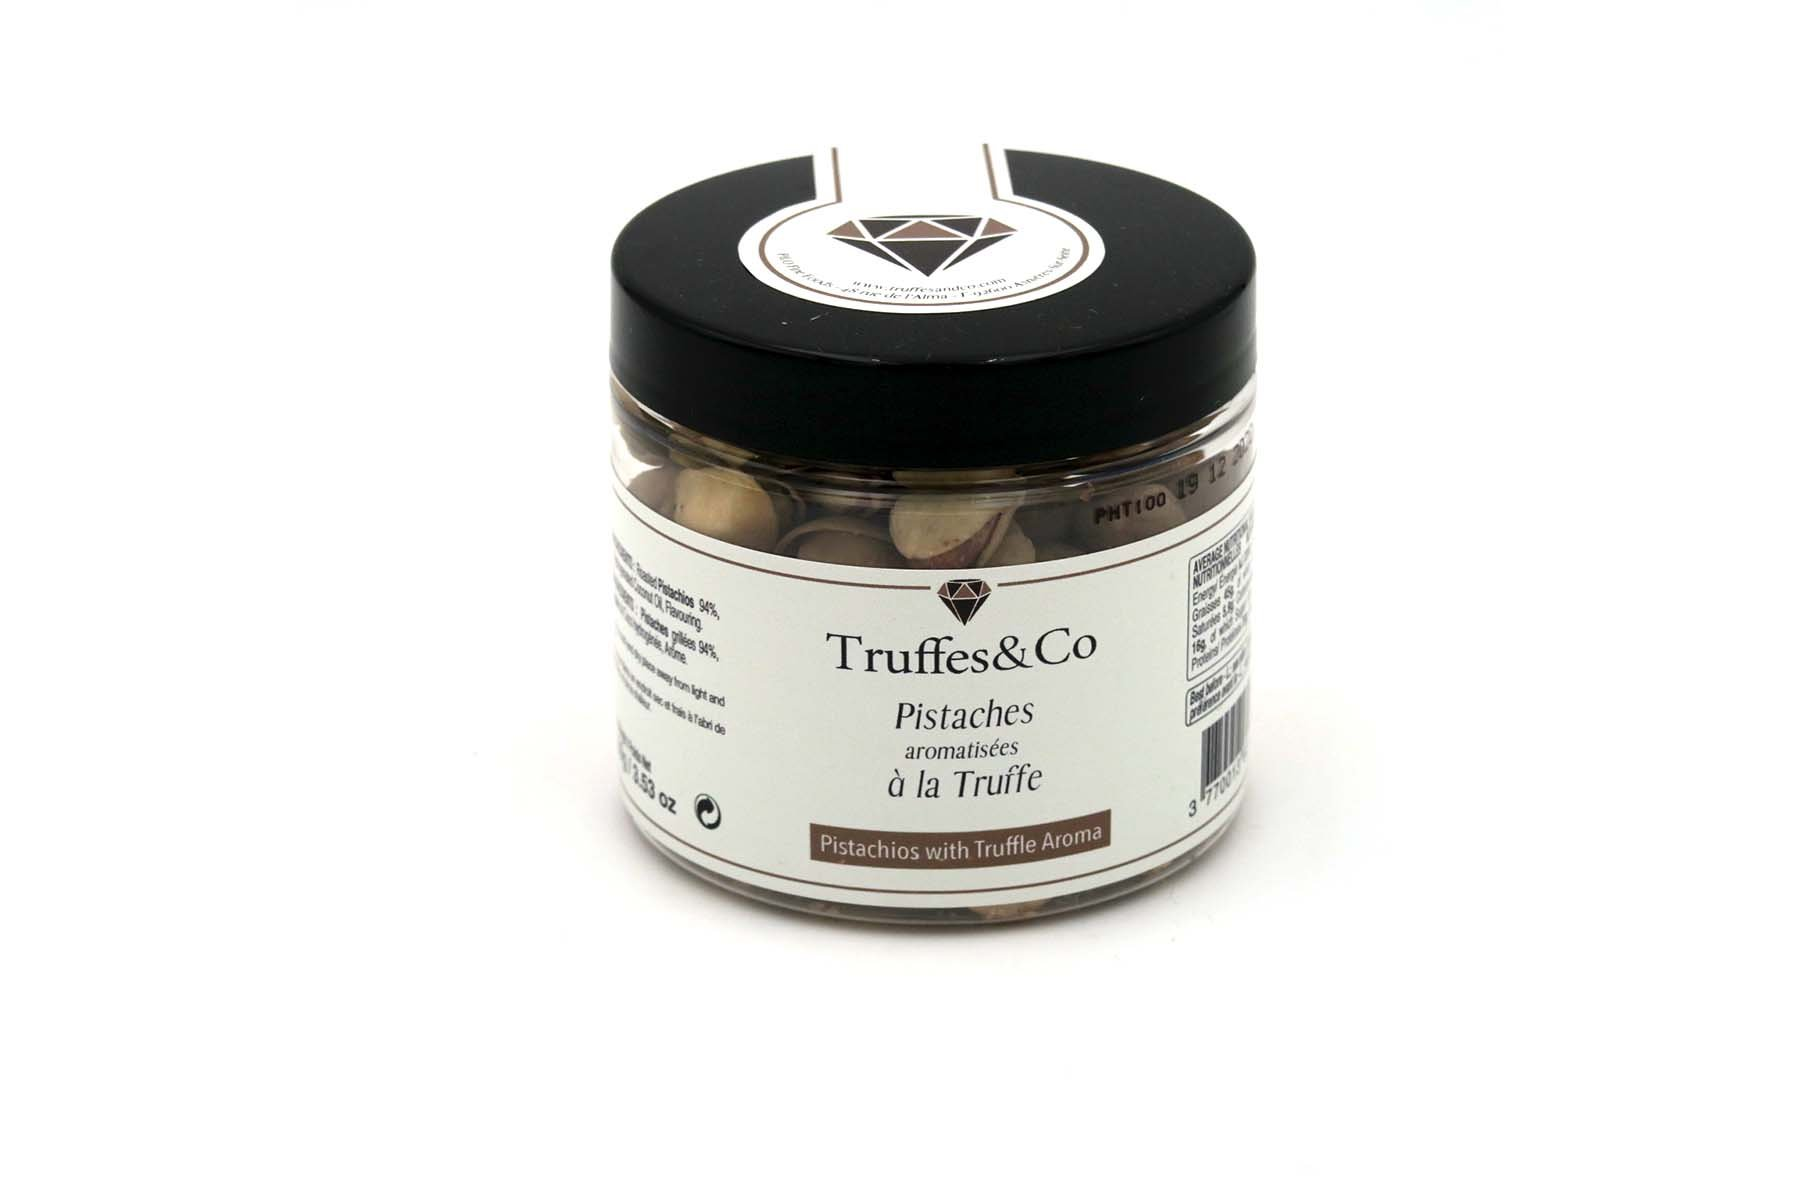 TC-PISTA100 Truffes&Co